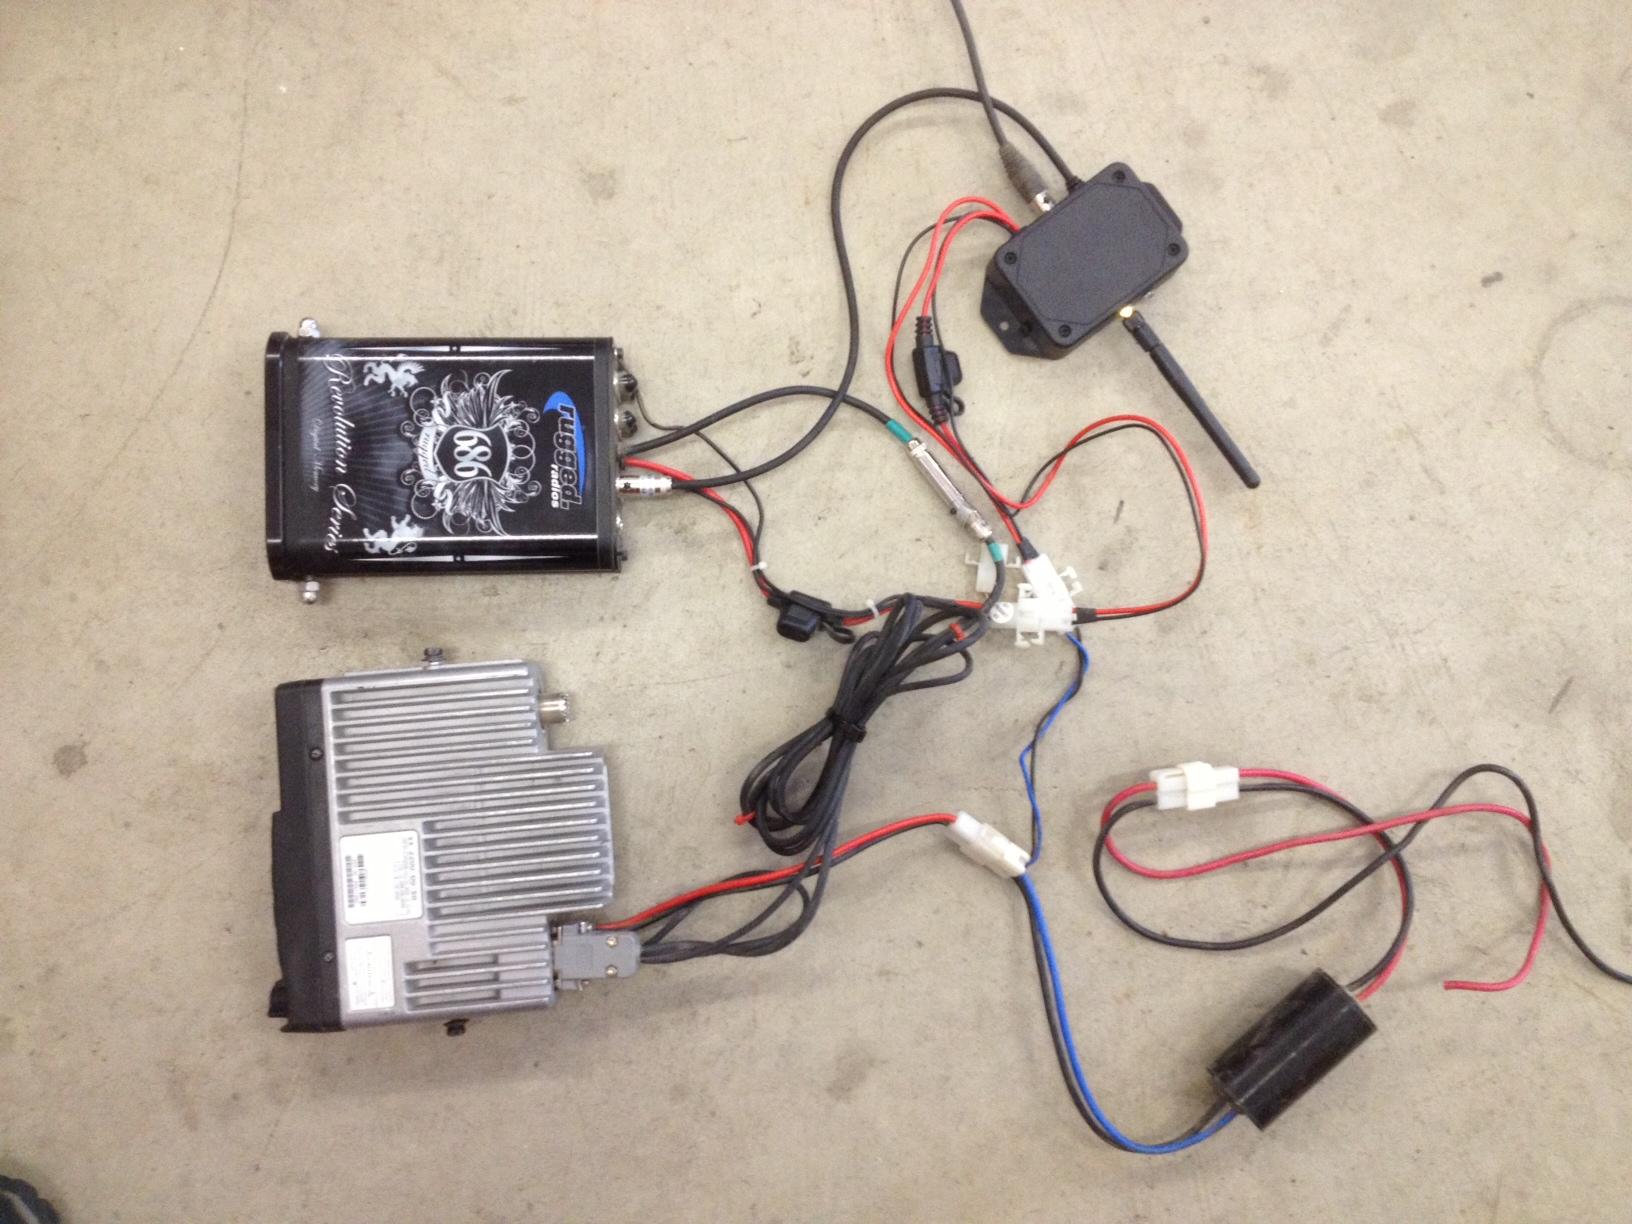 Rzr Xp 4 1000 Eps Warn Wiring Harness Wiring Diagram Wiring